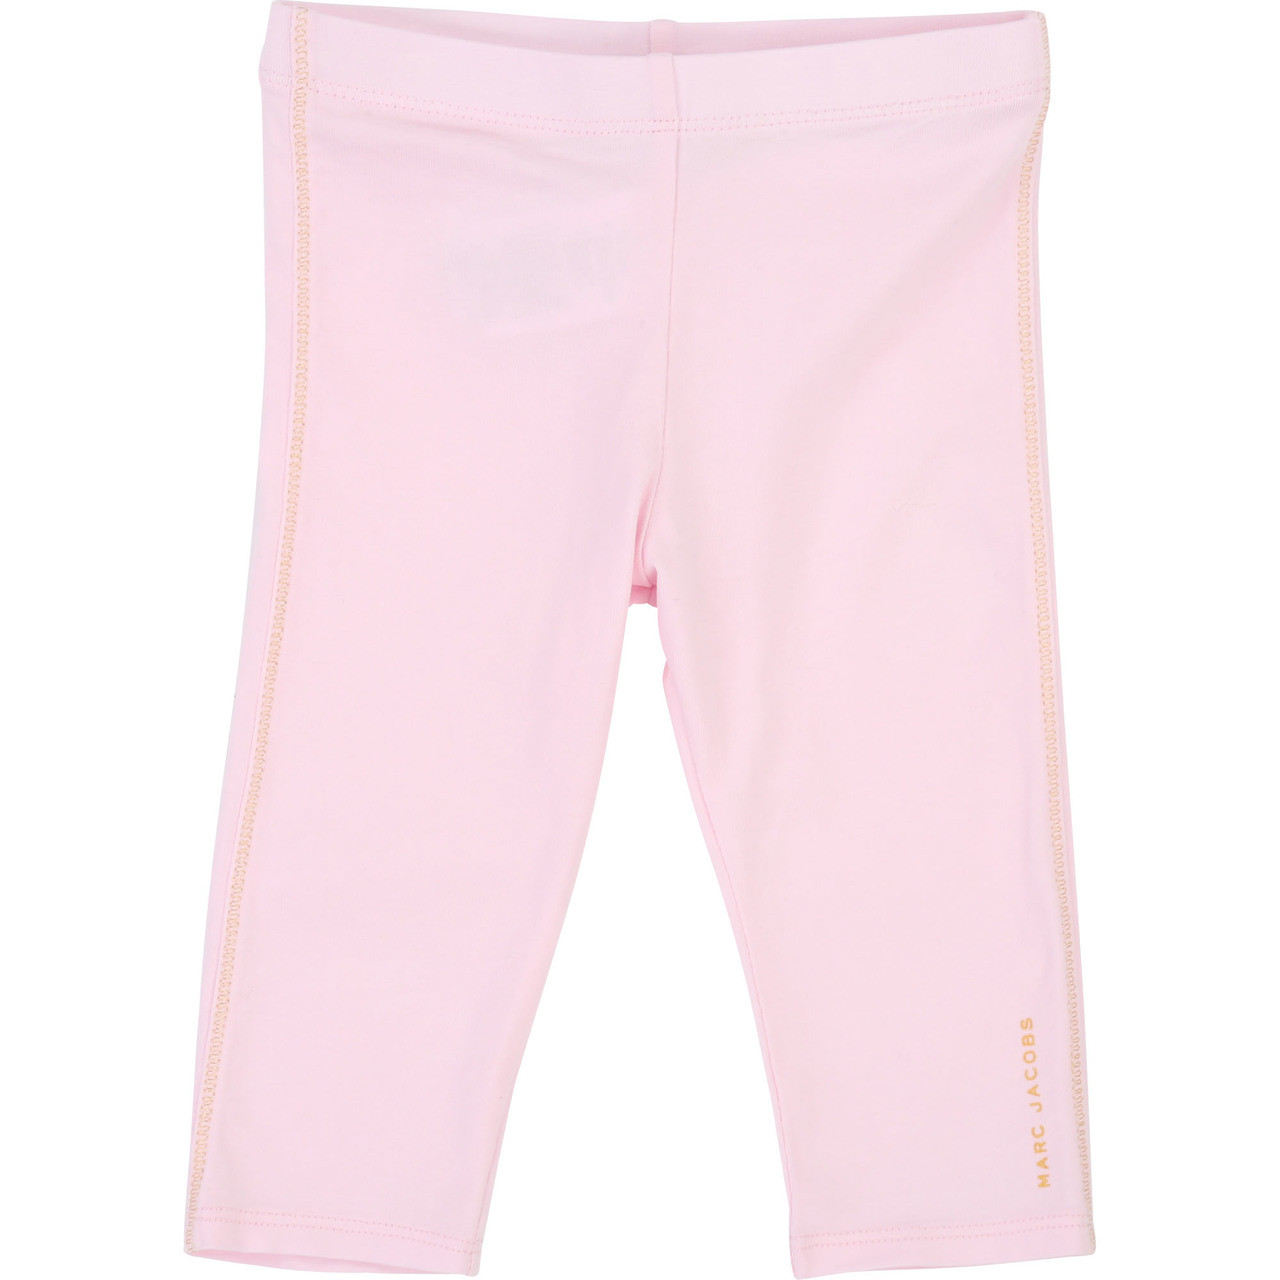 1167a6f893abd Baby Girls Pink Leggings - Coco Childrenswear